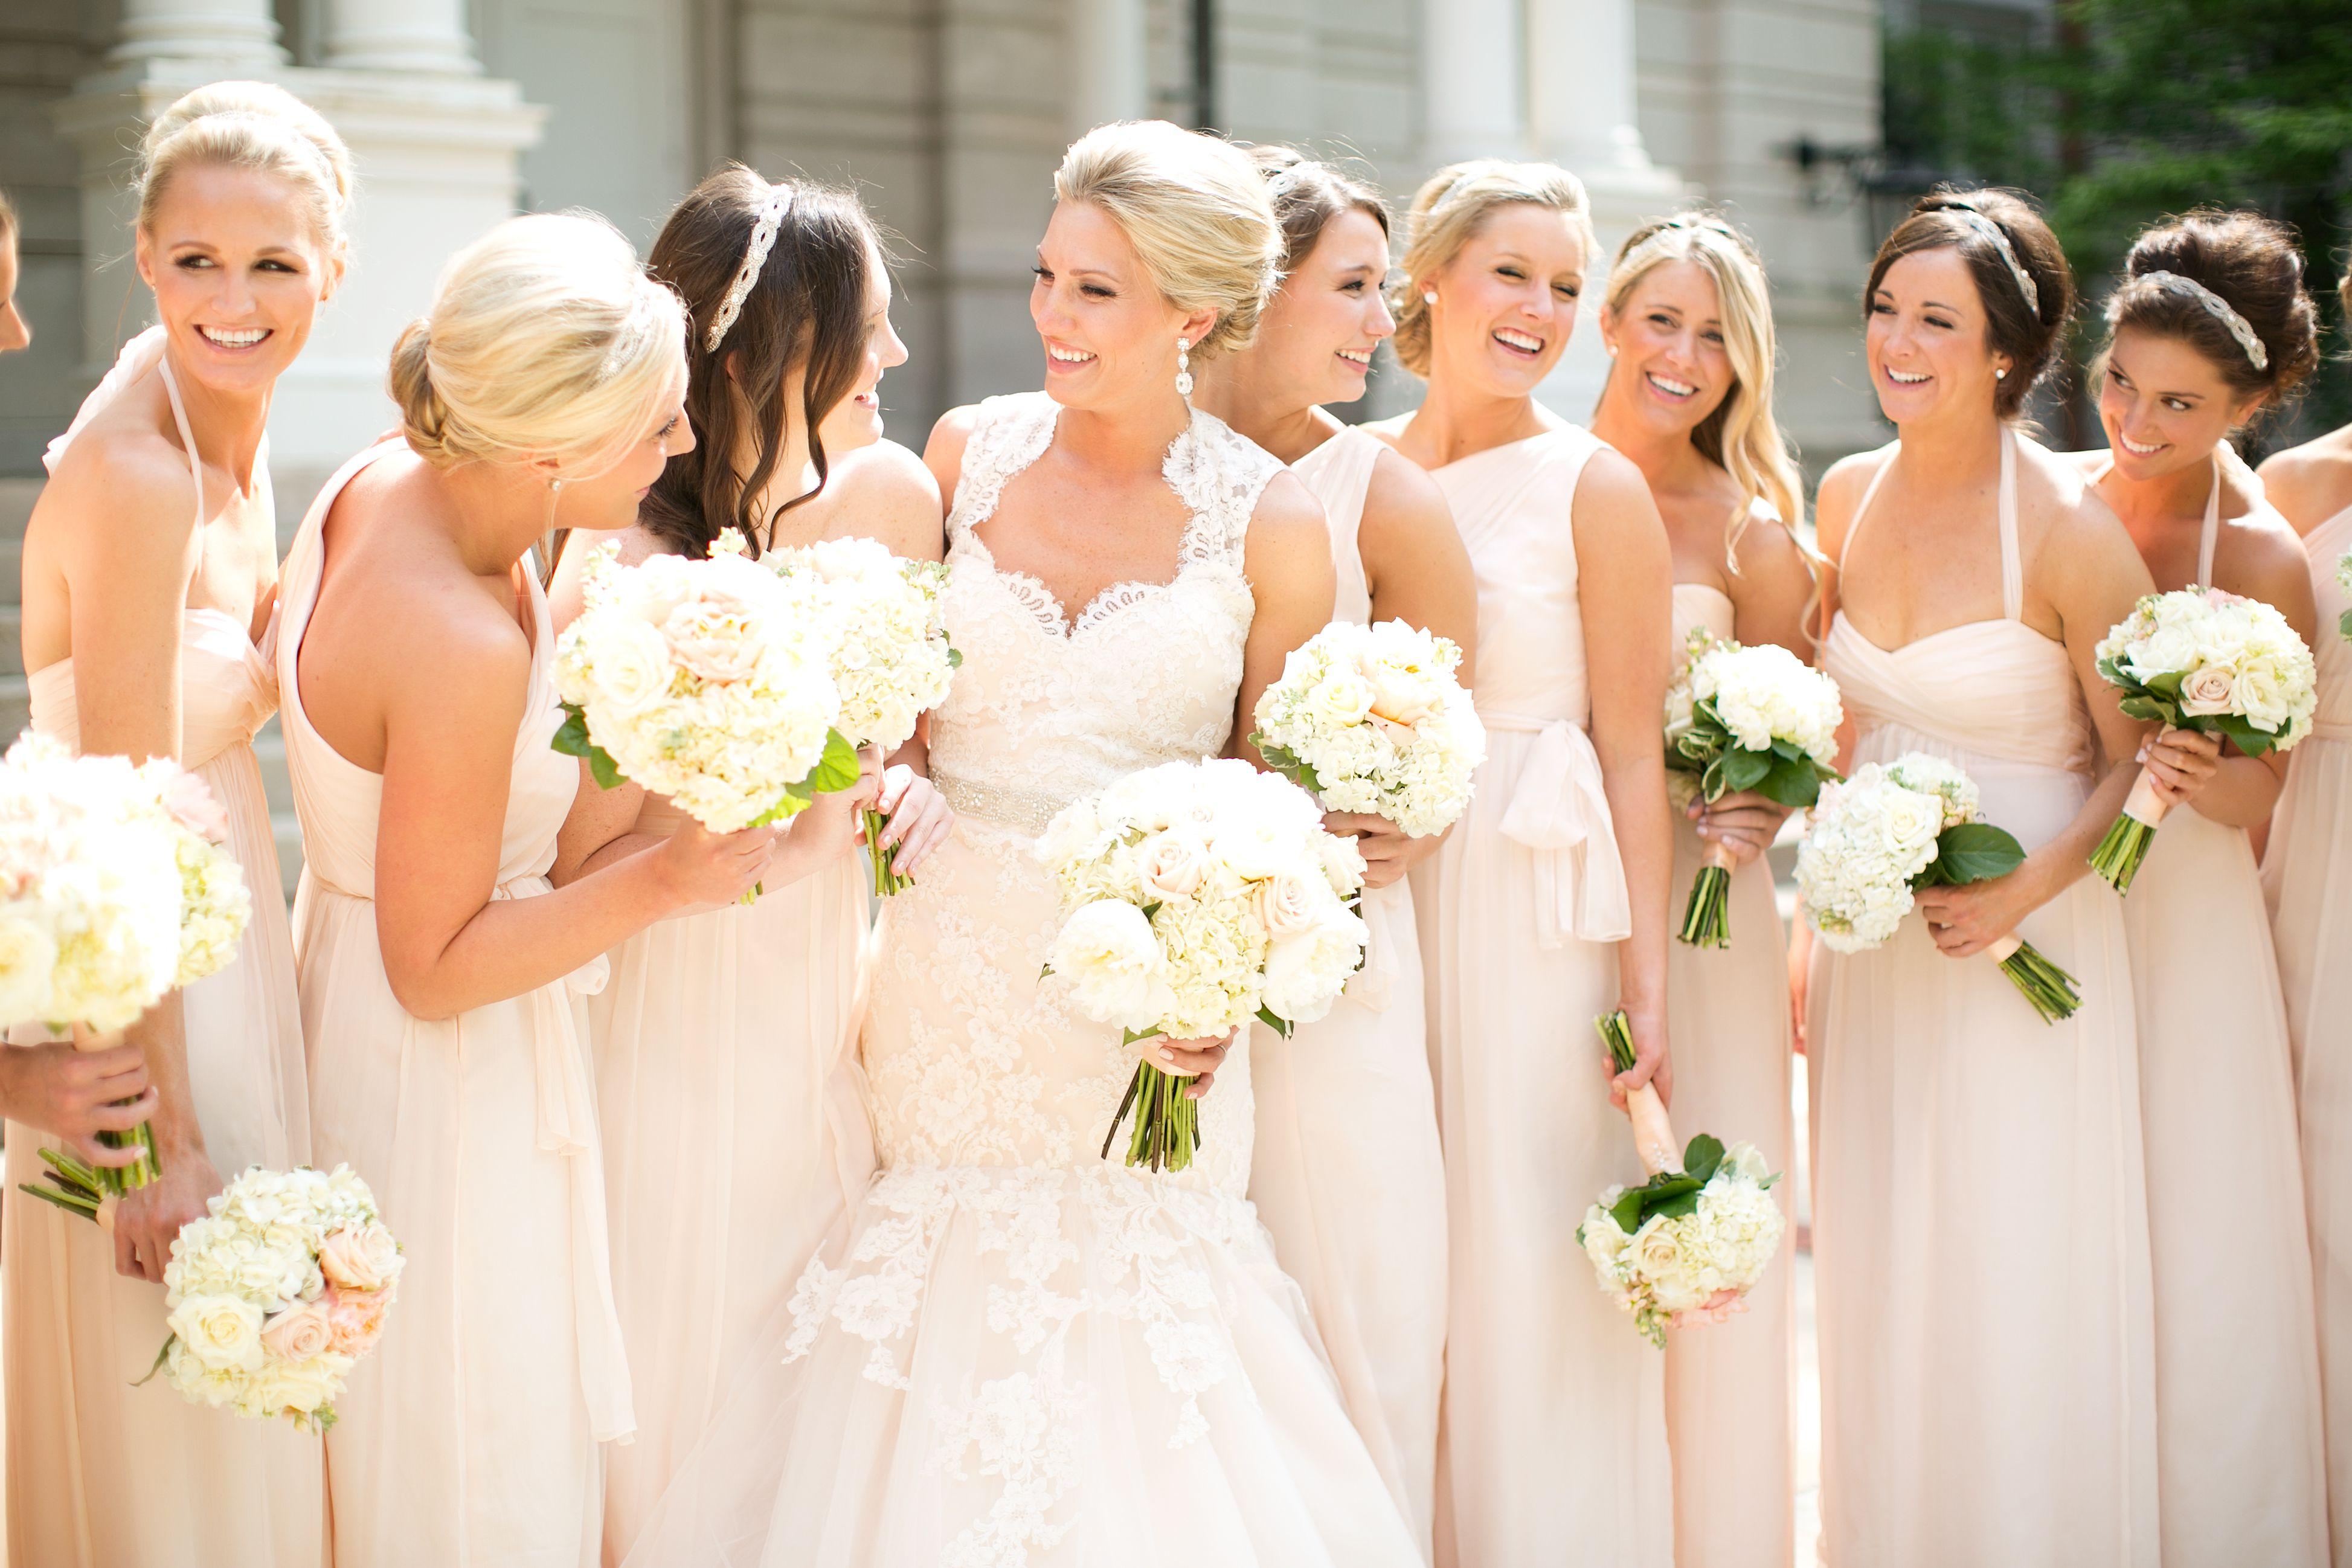 Blush bridesmaids dresses wedding pink wedding colors and wedding blush bridesmaids dresses ombrellifo Images